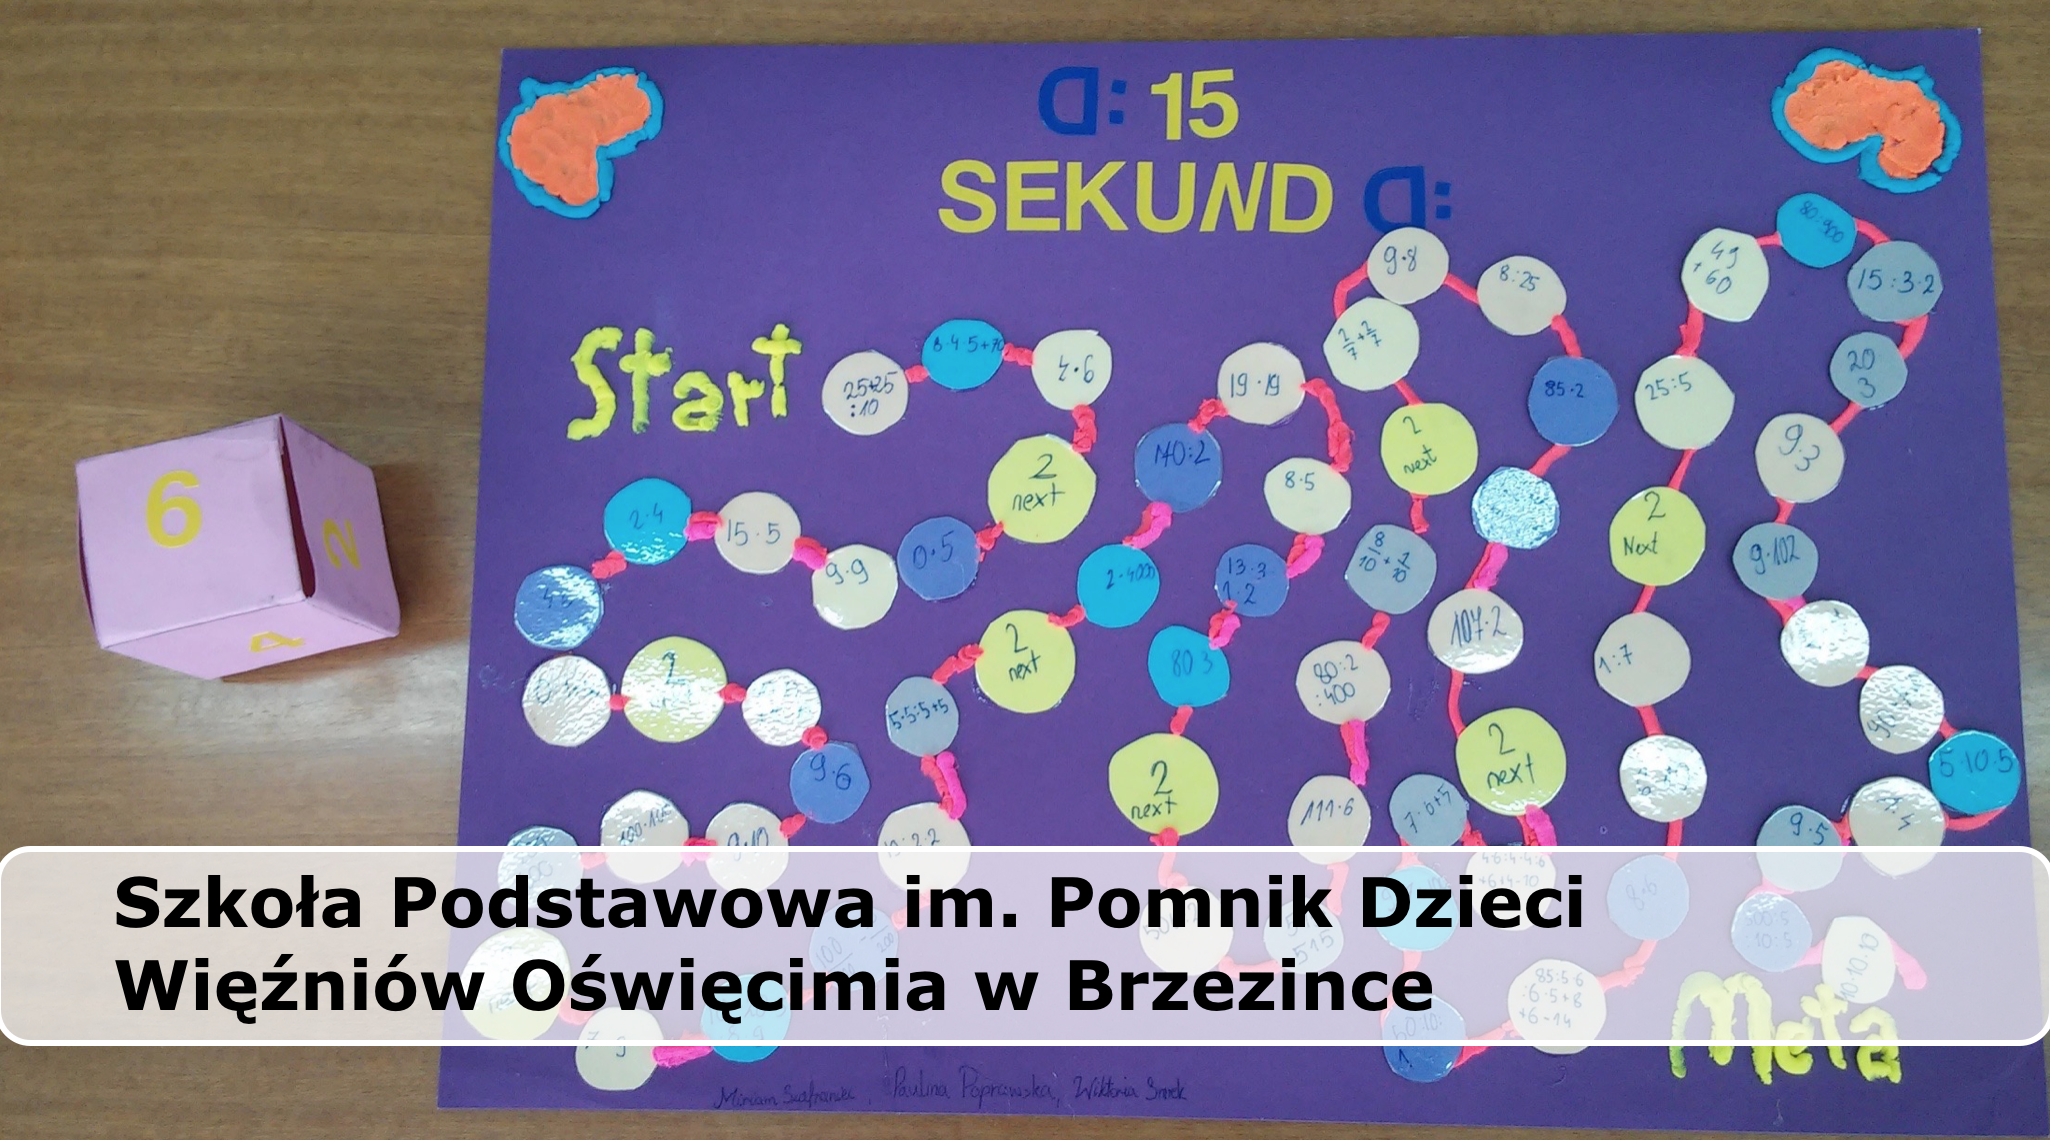 Zrzut ekranu 2017-03-13 o 16.18.43